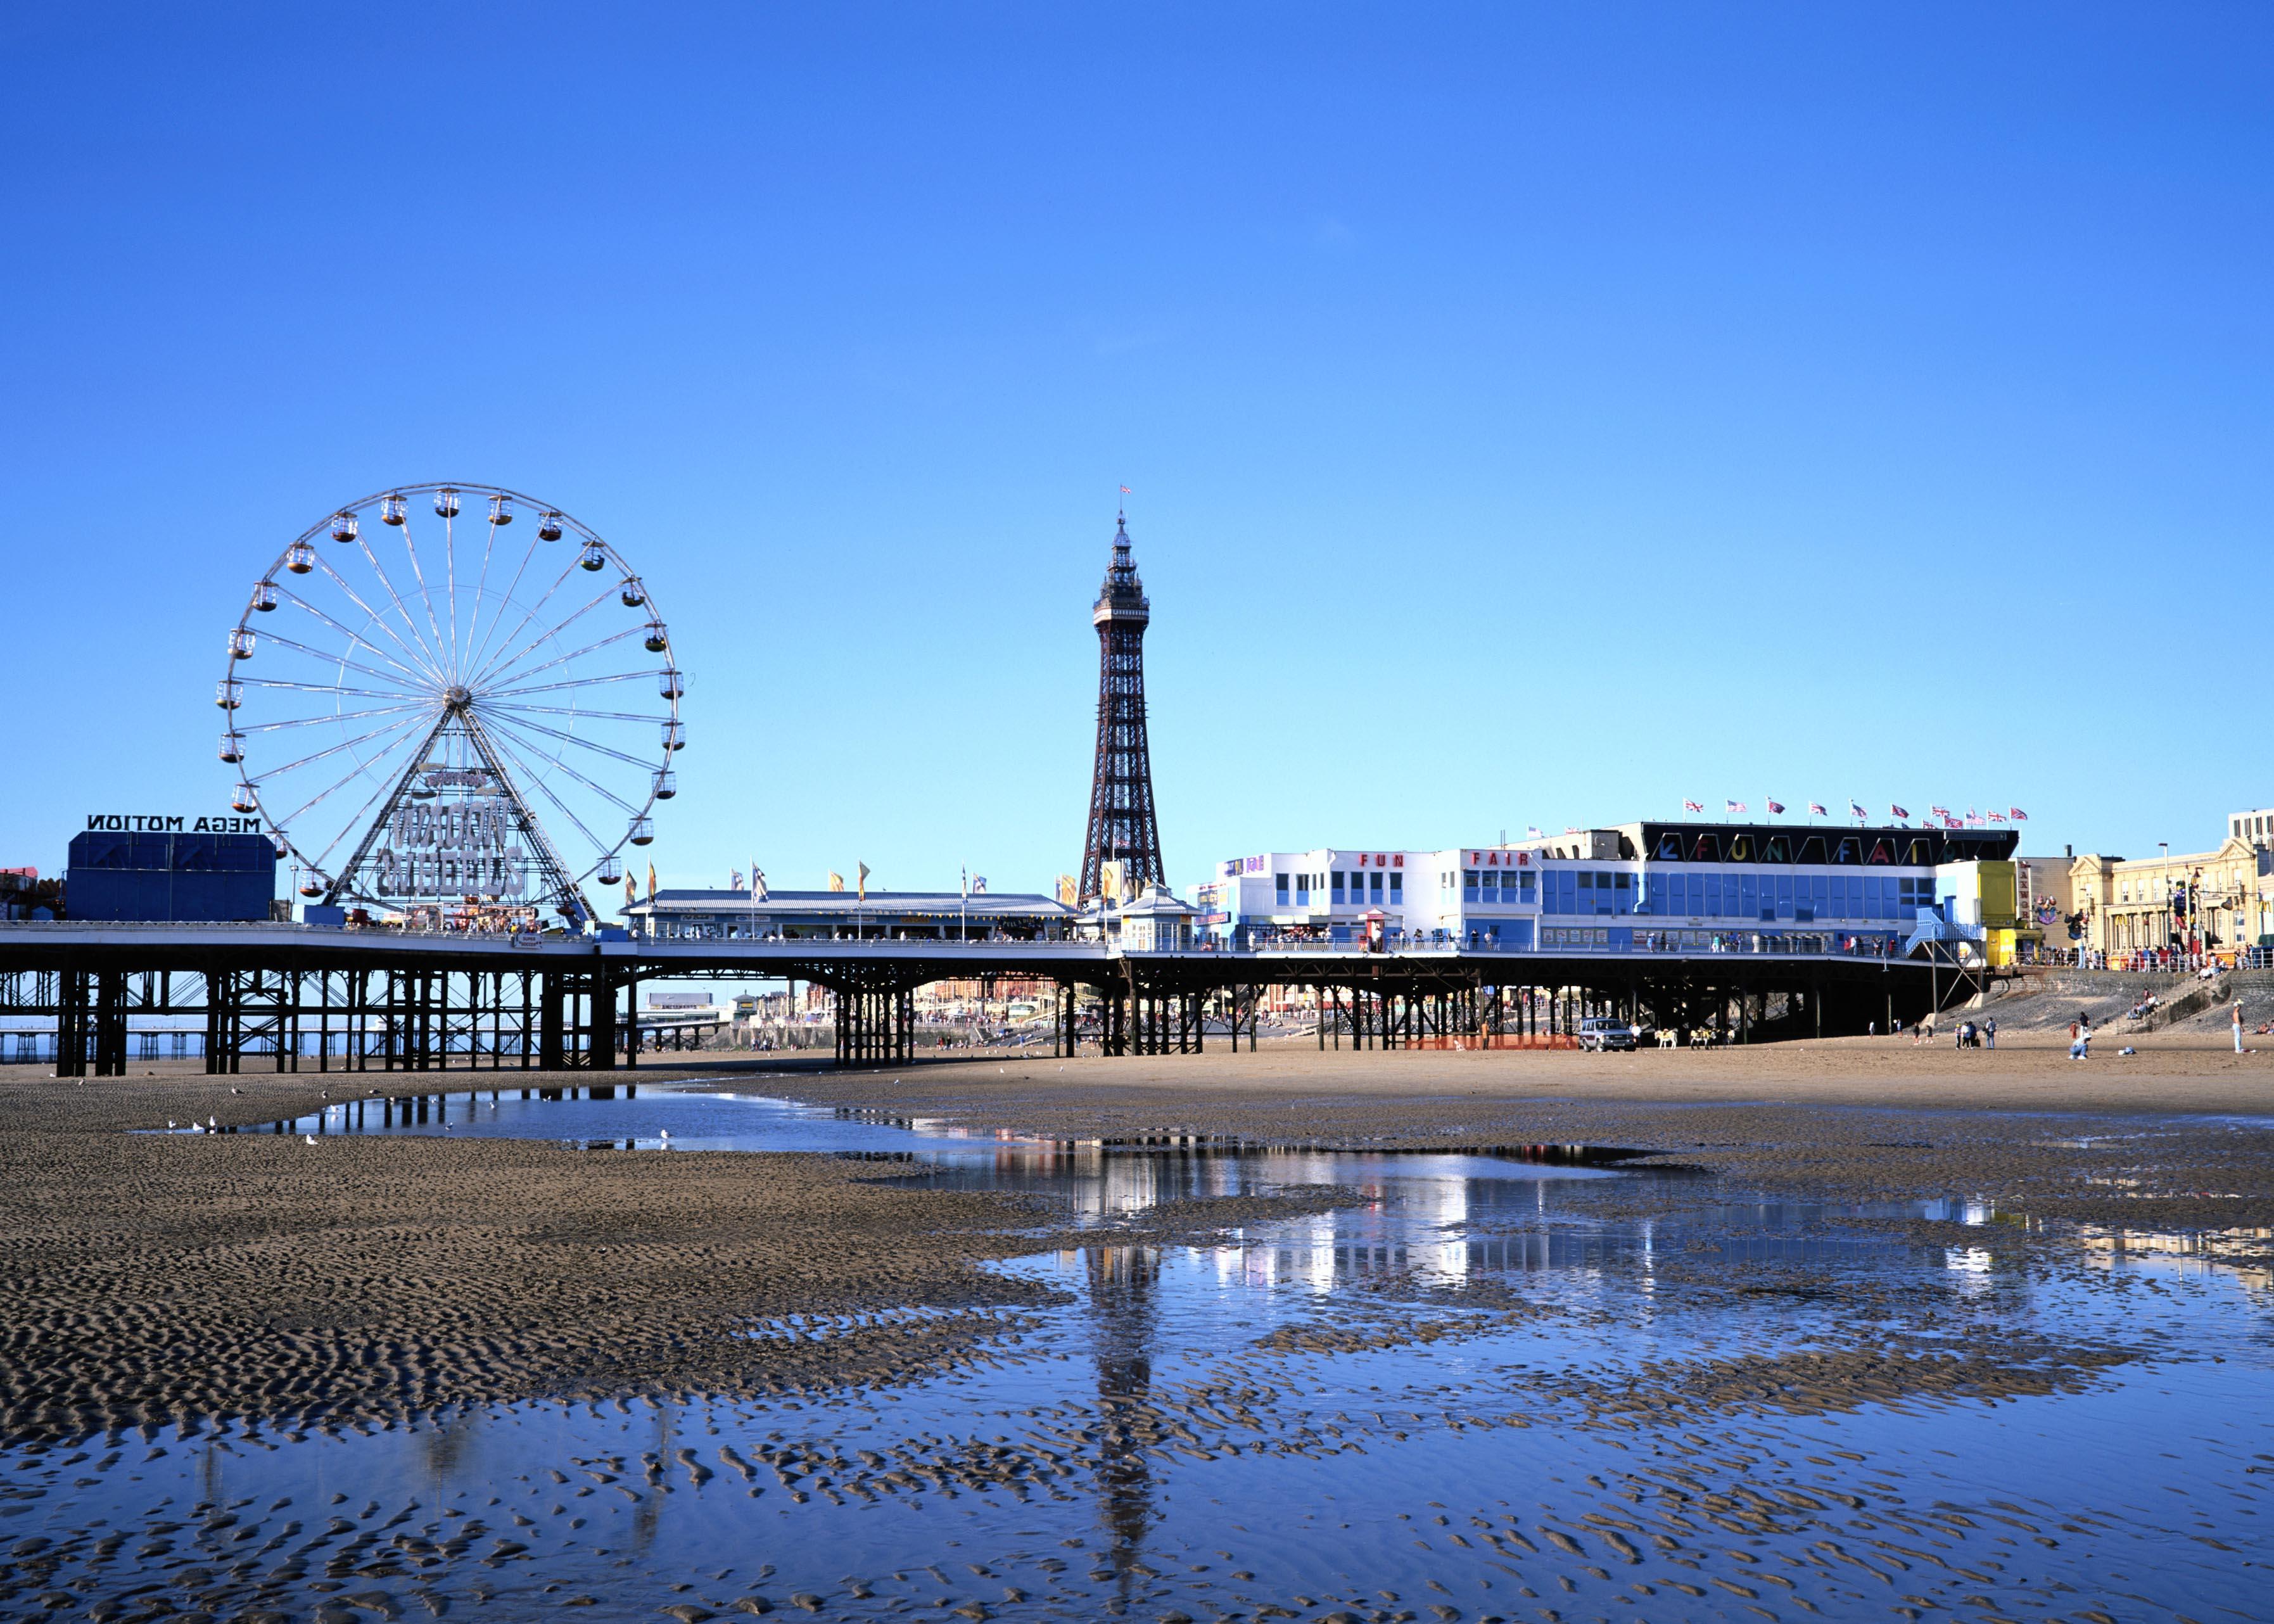 Blackpool, Verenigd Koninkrijk